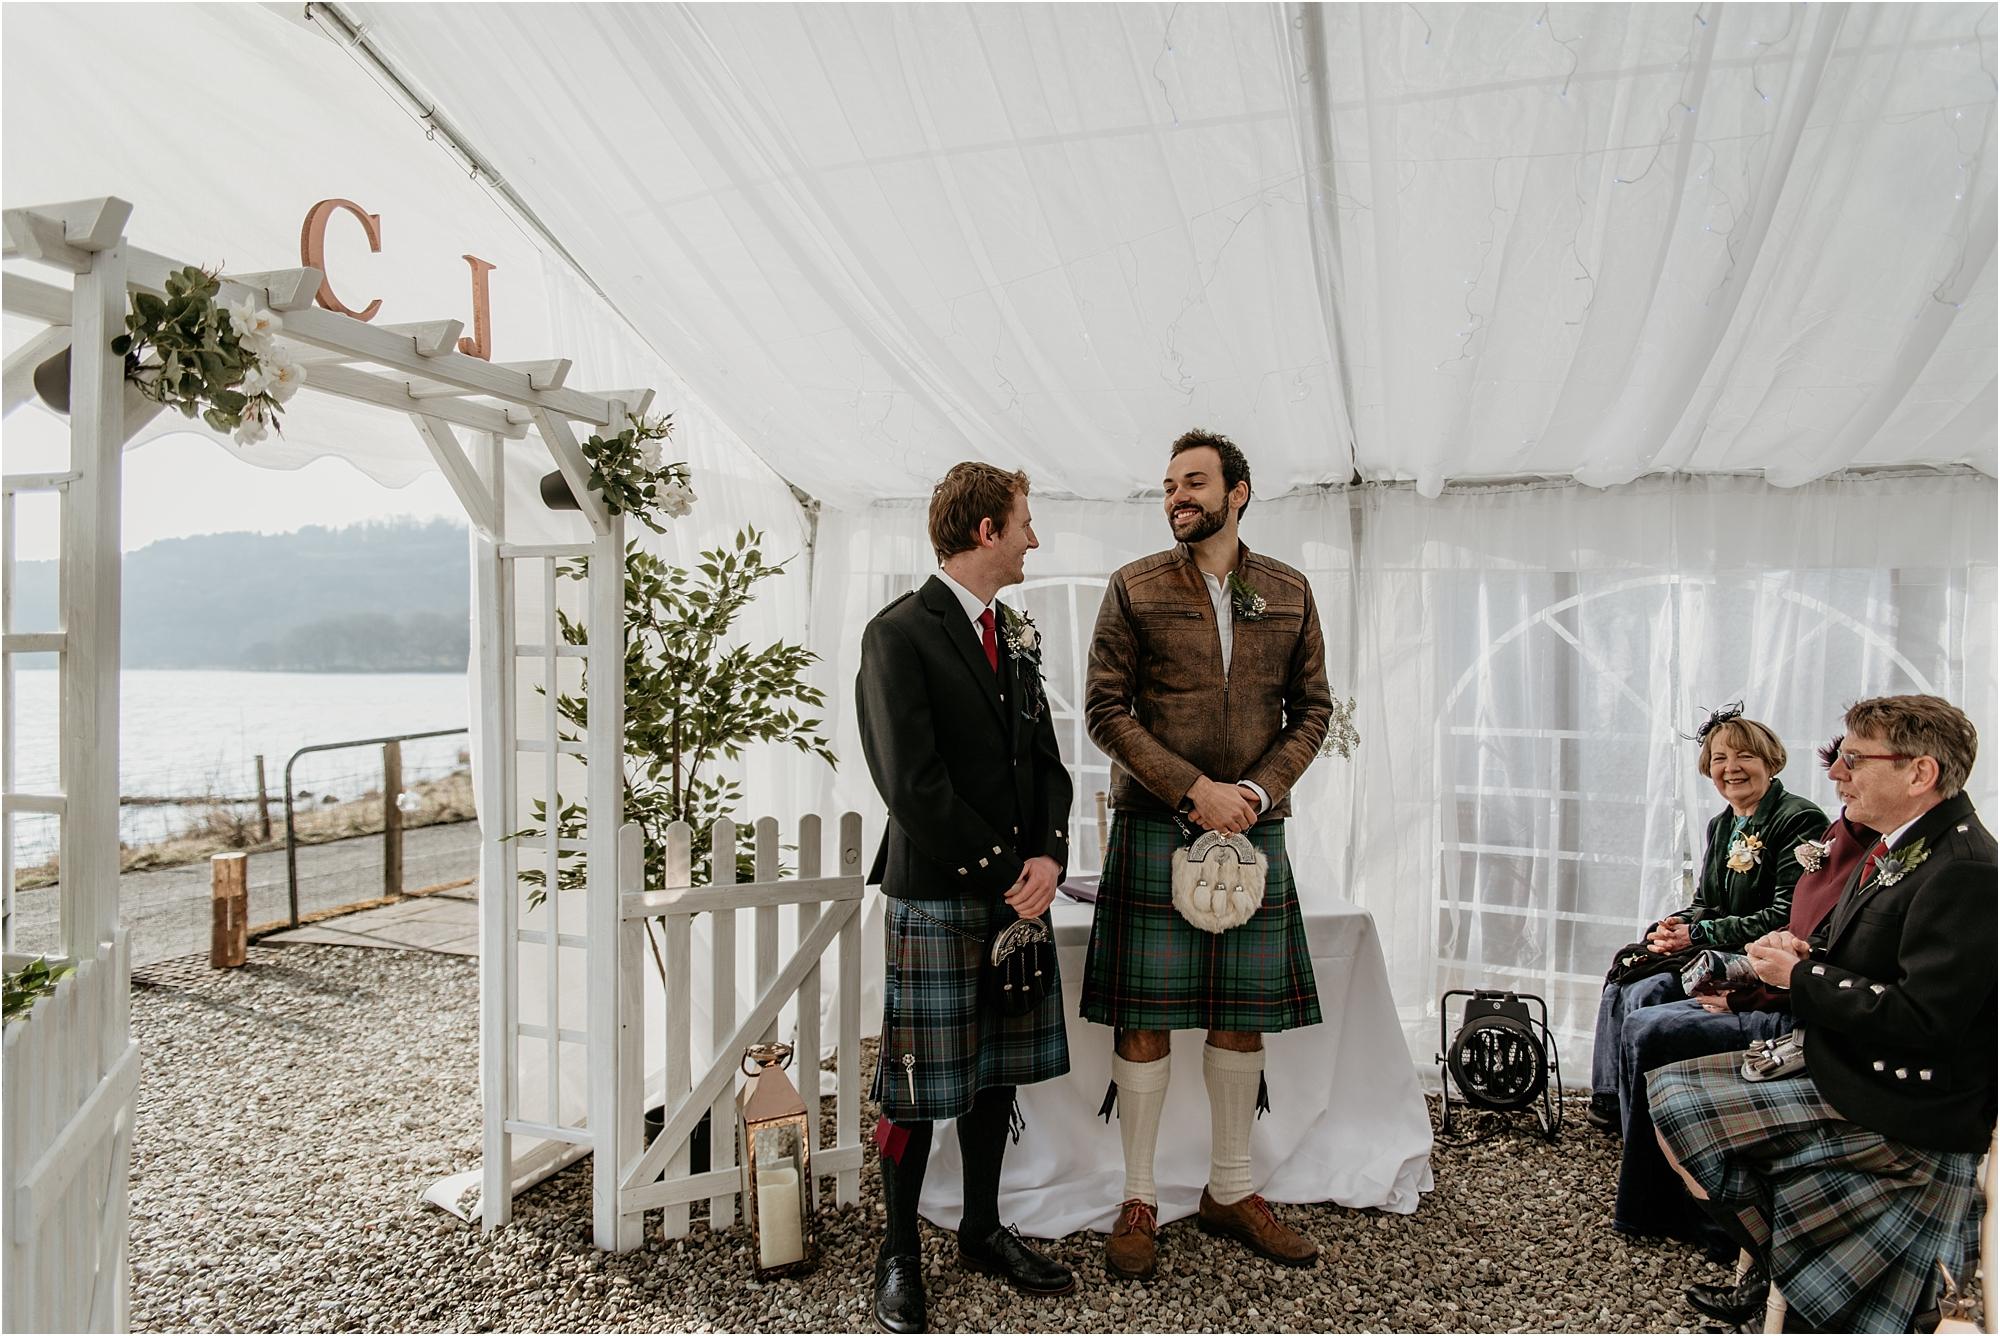 Kinlochard-village-hall-scottish-wedding-claire-fleck-photography__0019.jpg